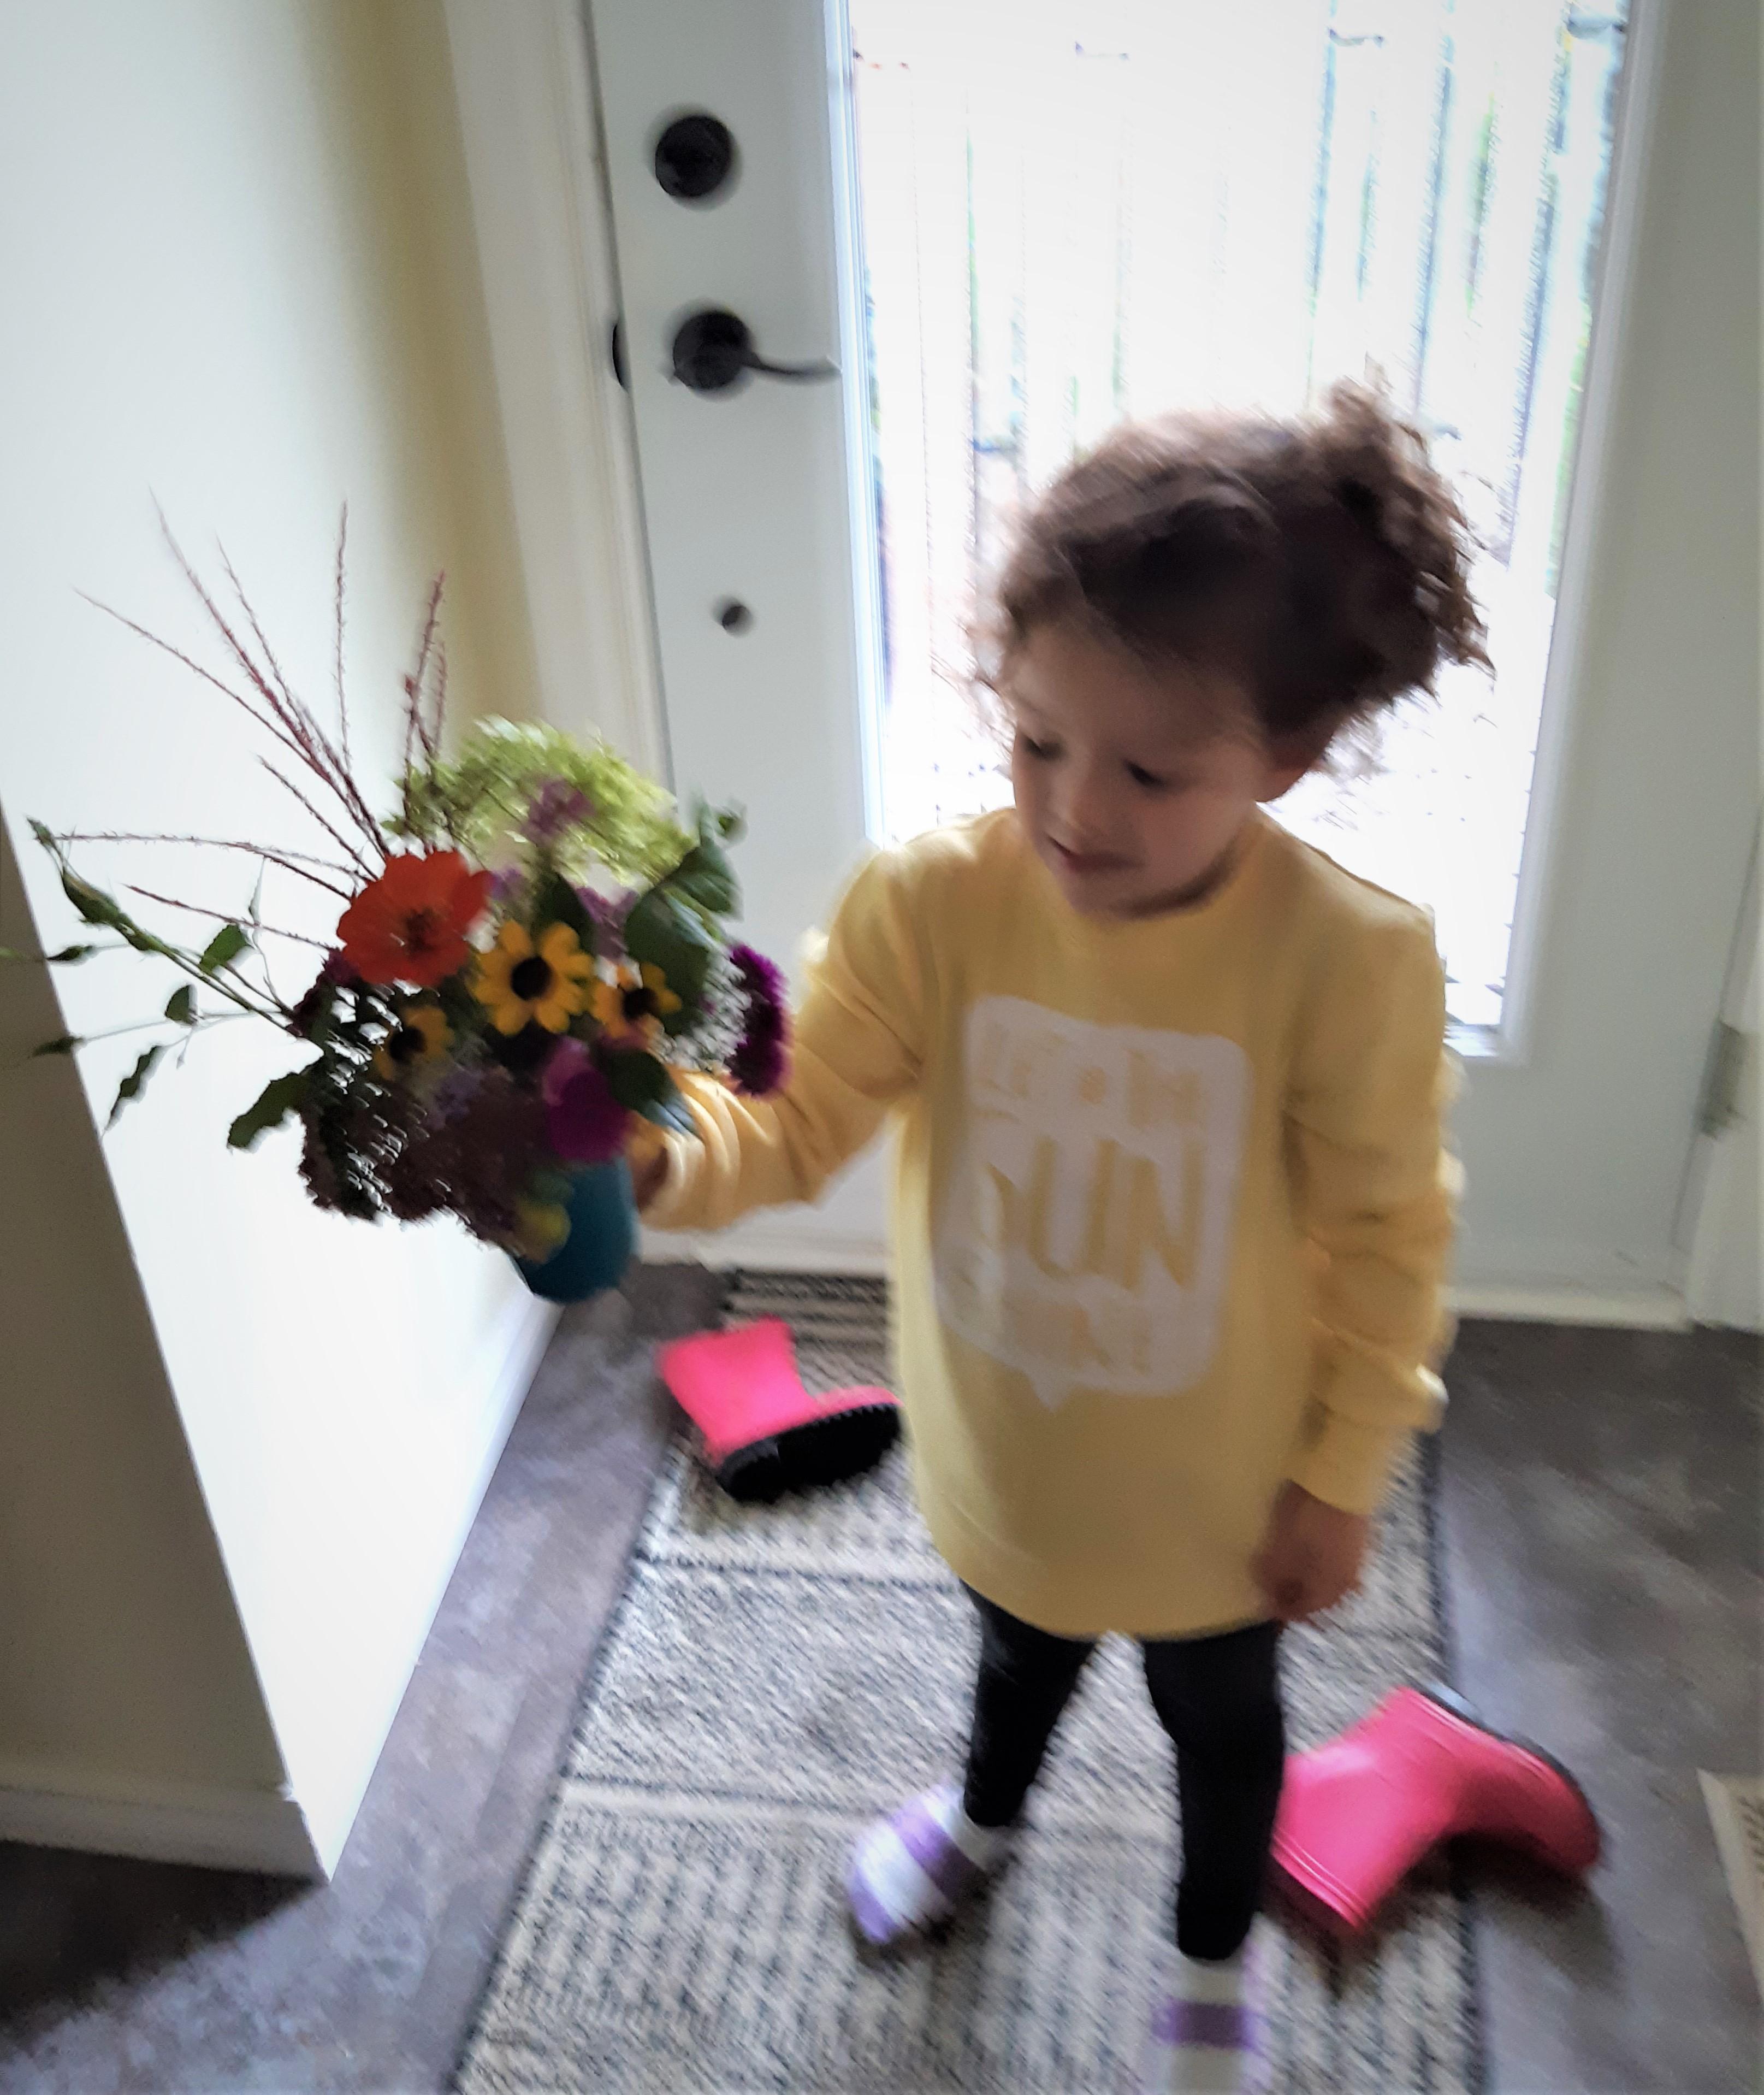 Fall Garden Chores Results in Beautiful Bouquet